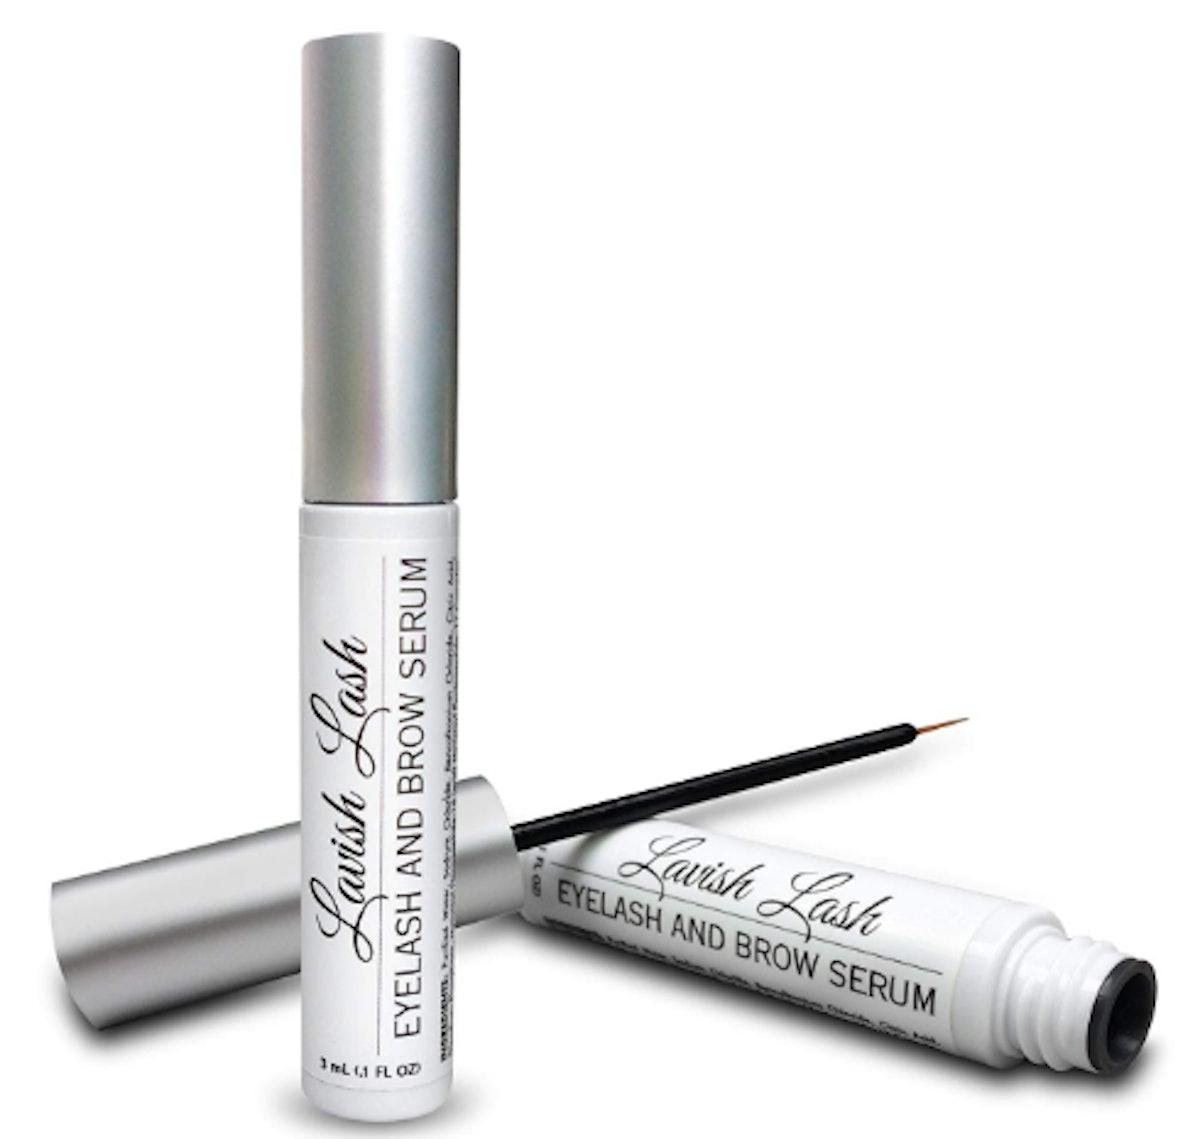 Pronexa Hairgenics Lavish Lash - Eyelash Growth Enhancer & Brow Serum